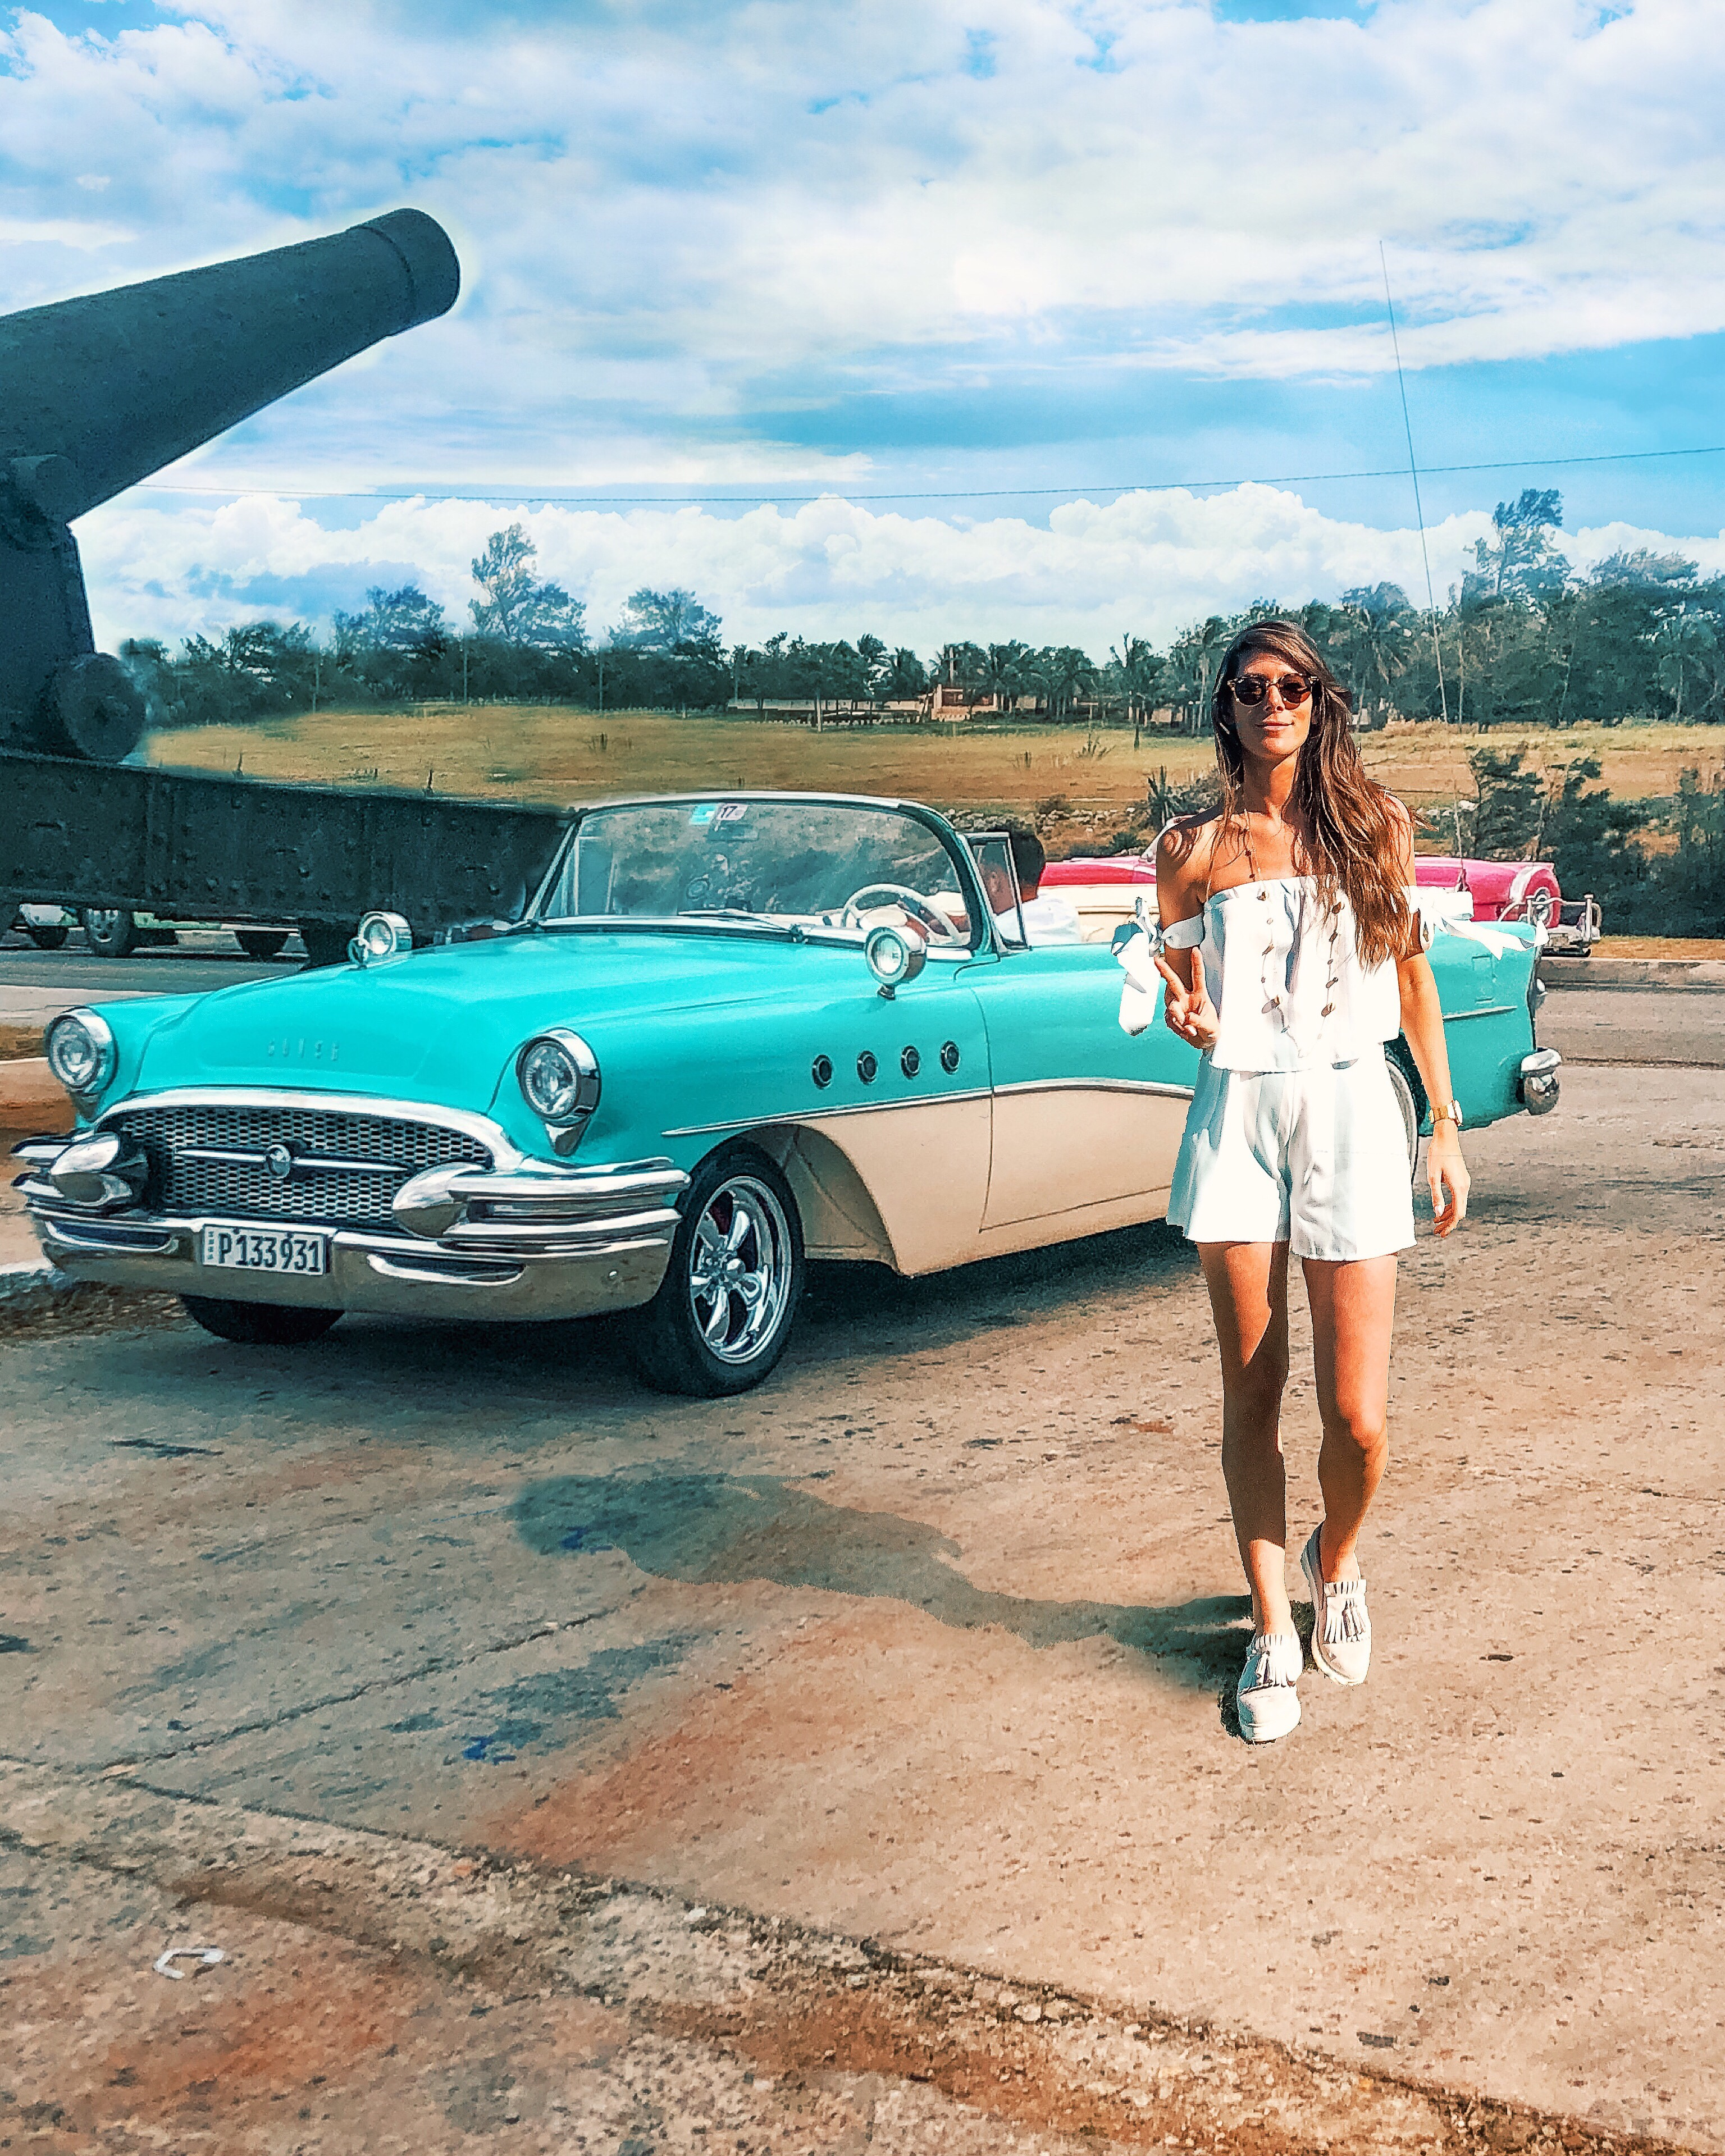 Havana Cuba Sunset Cadillac Buick Car Girl